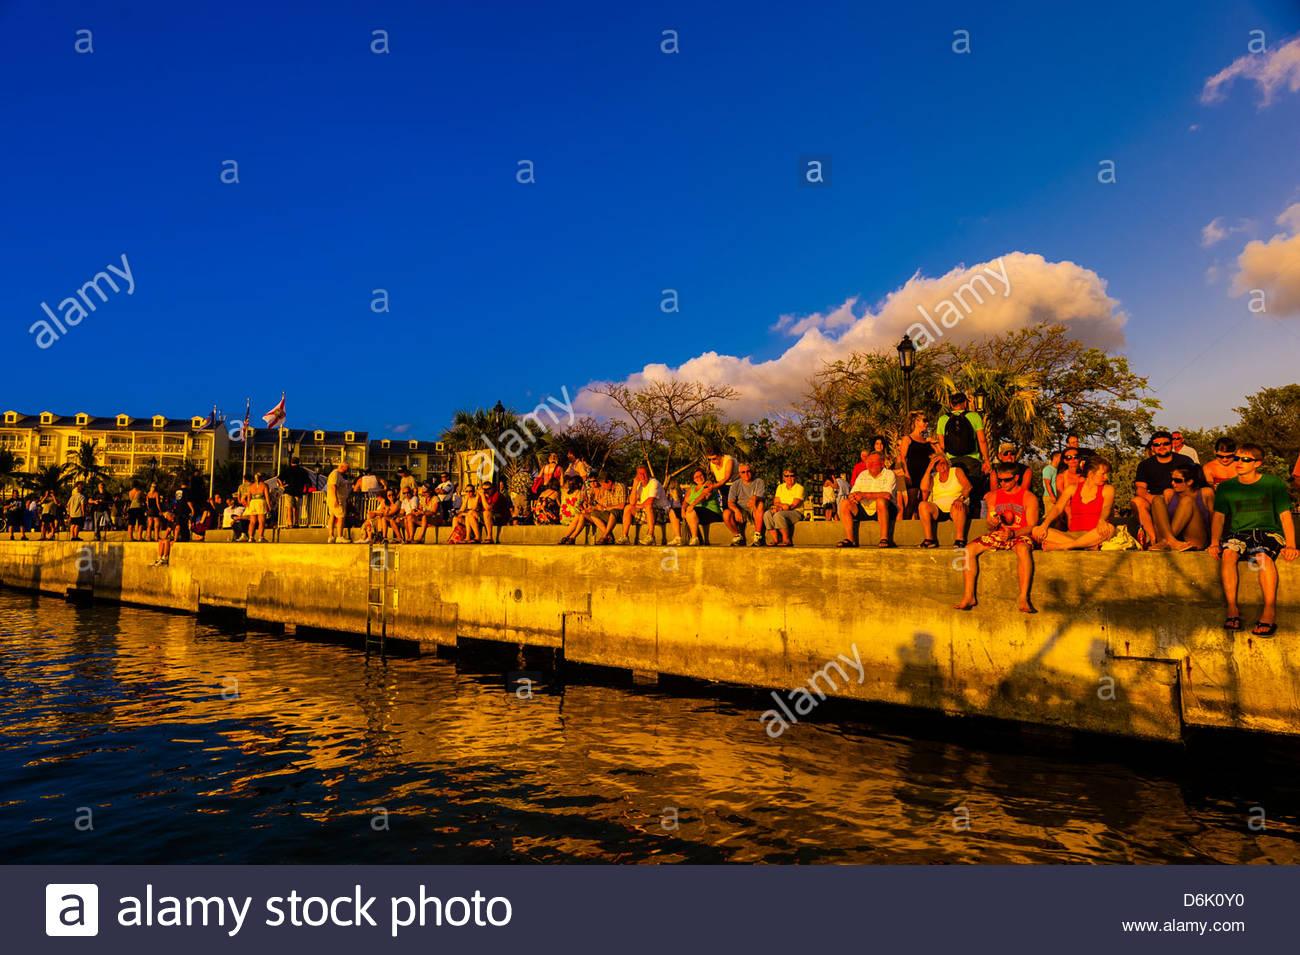 People gathering at Mallory Square for the daily Sunset Celebration, Key West, Florida Keys, Florida USA - Stock Image